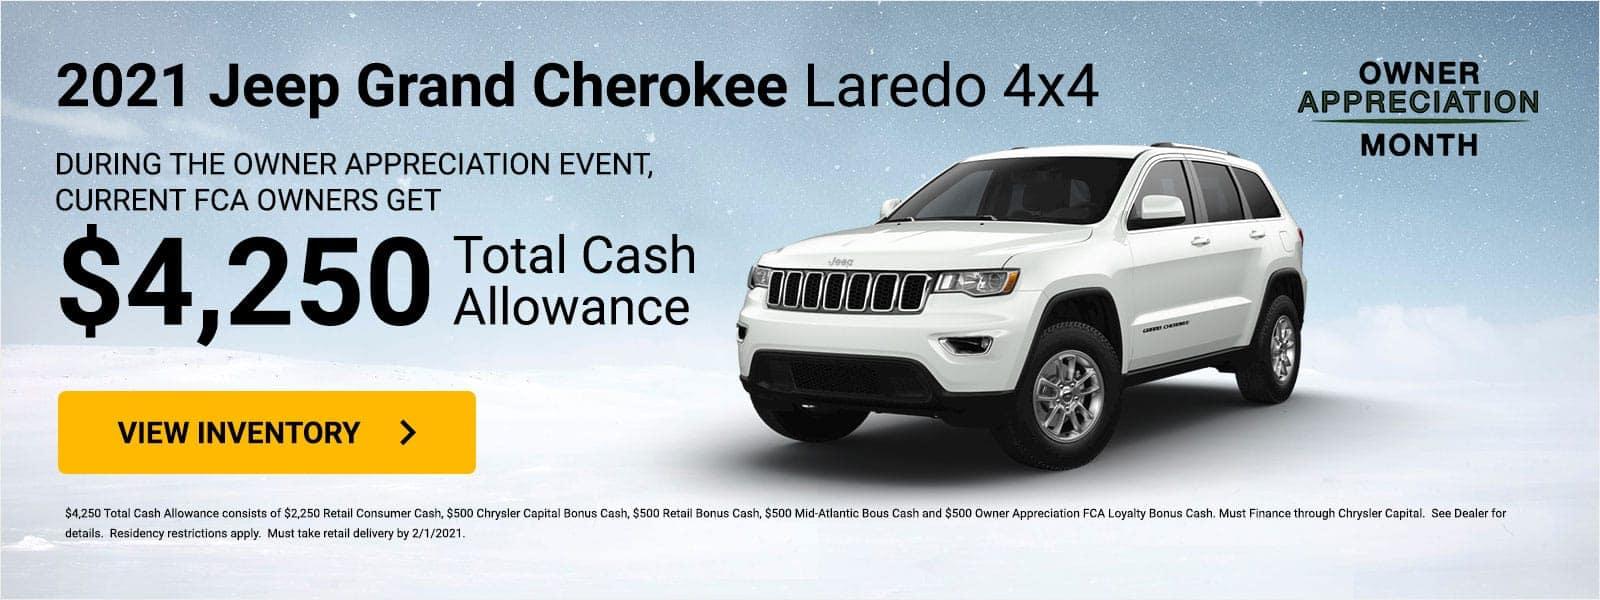 jeep-grand-cherokee-laredo-4x4 RETAIL